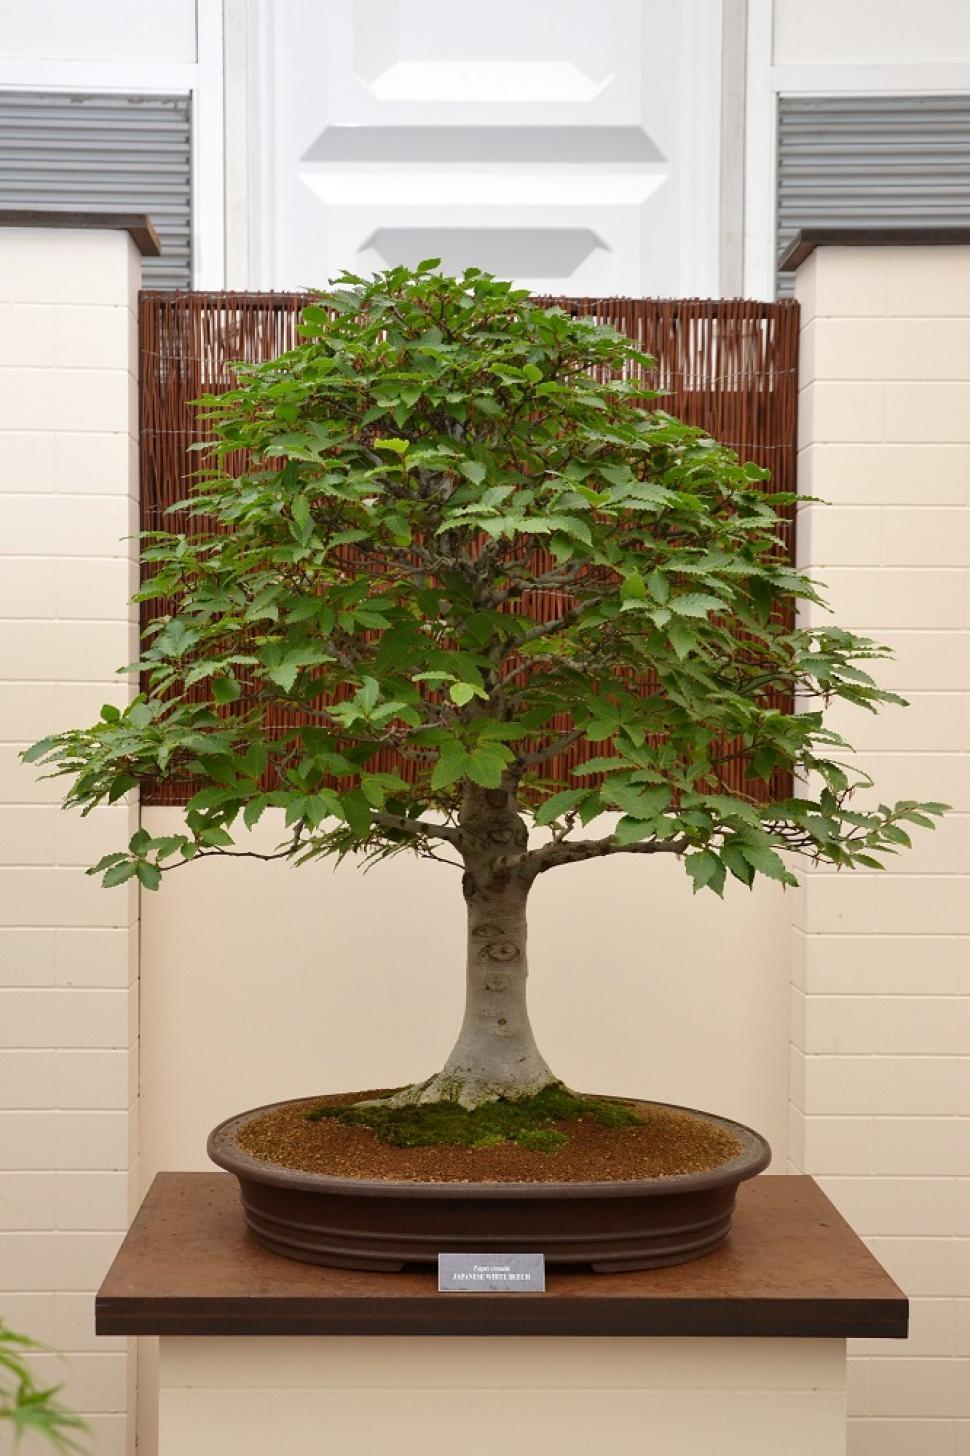 Download Free Stock Photo of Japanese white beech bonsai